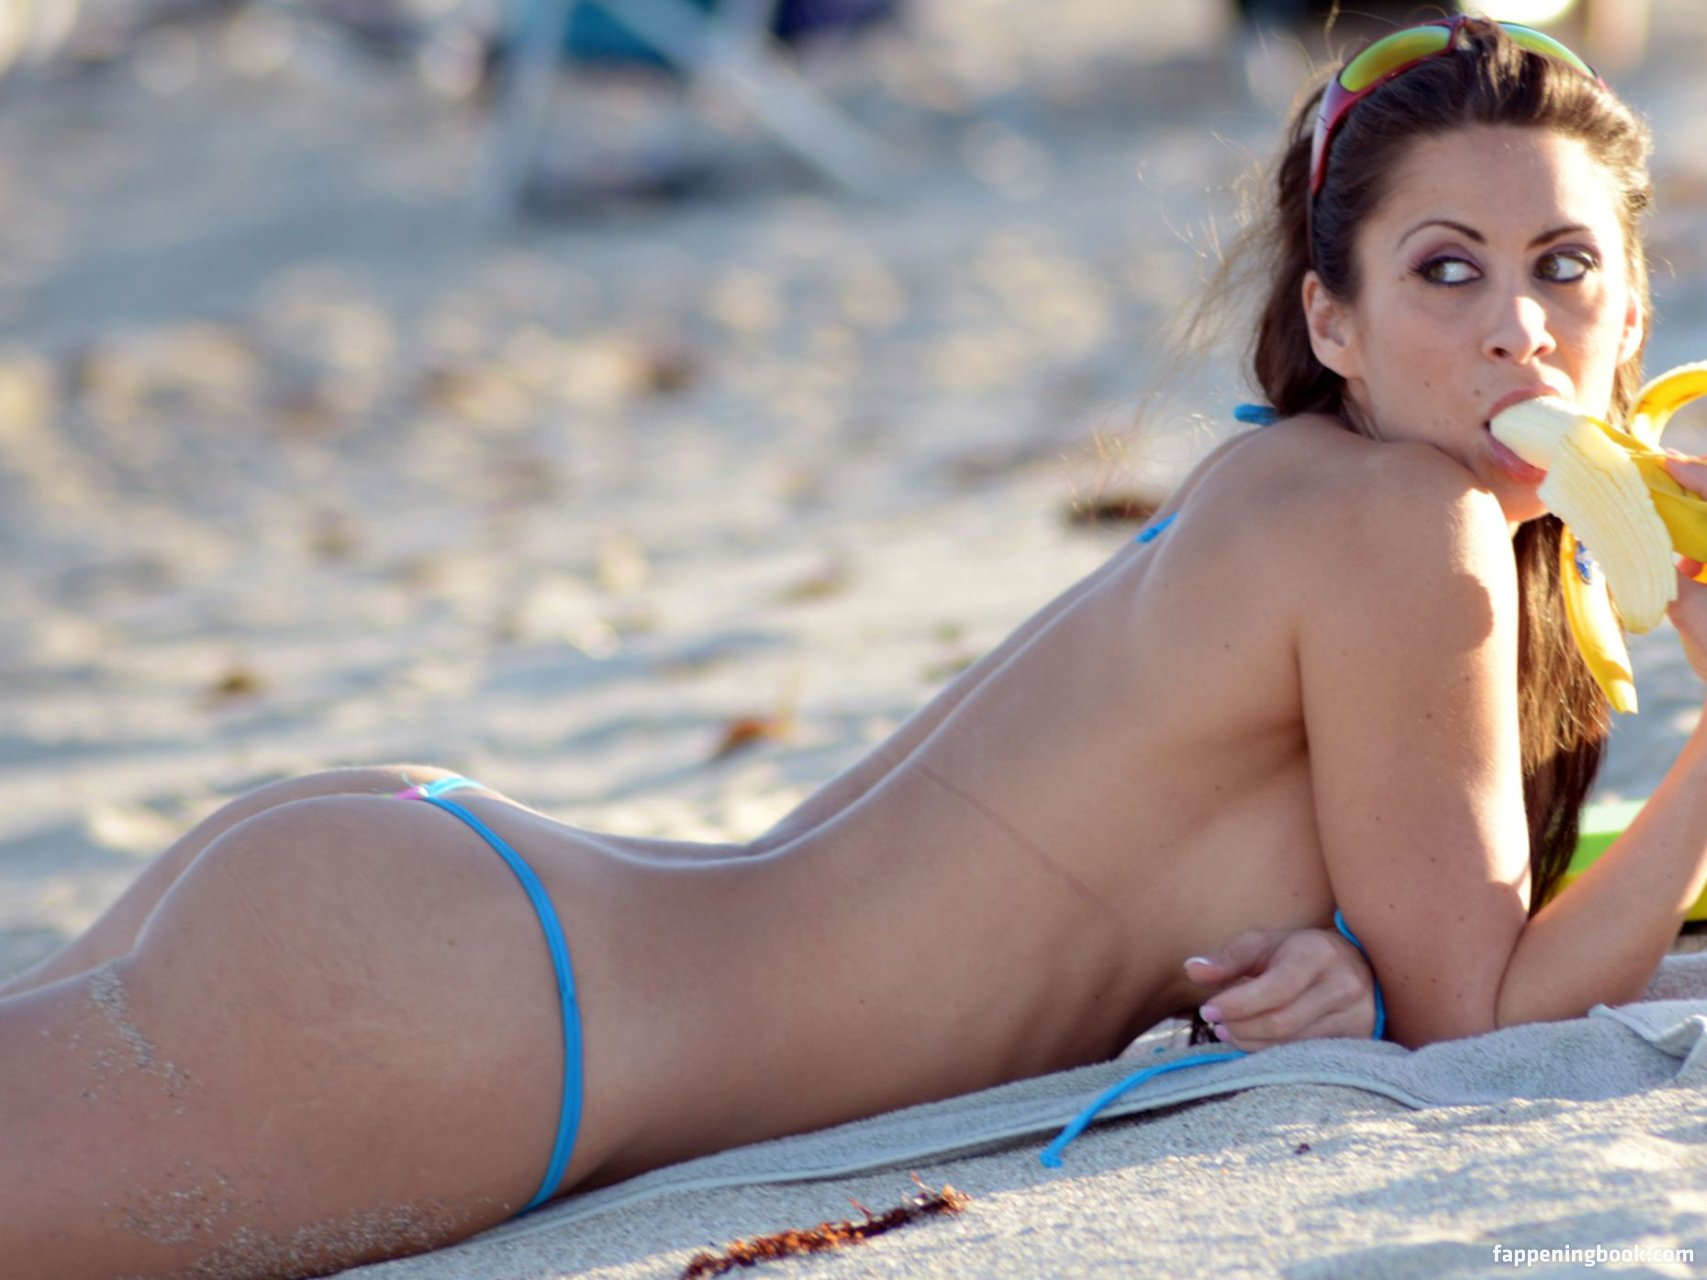 Noah Cyrus Nude Photos Leaked Pics